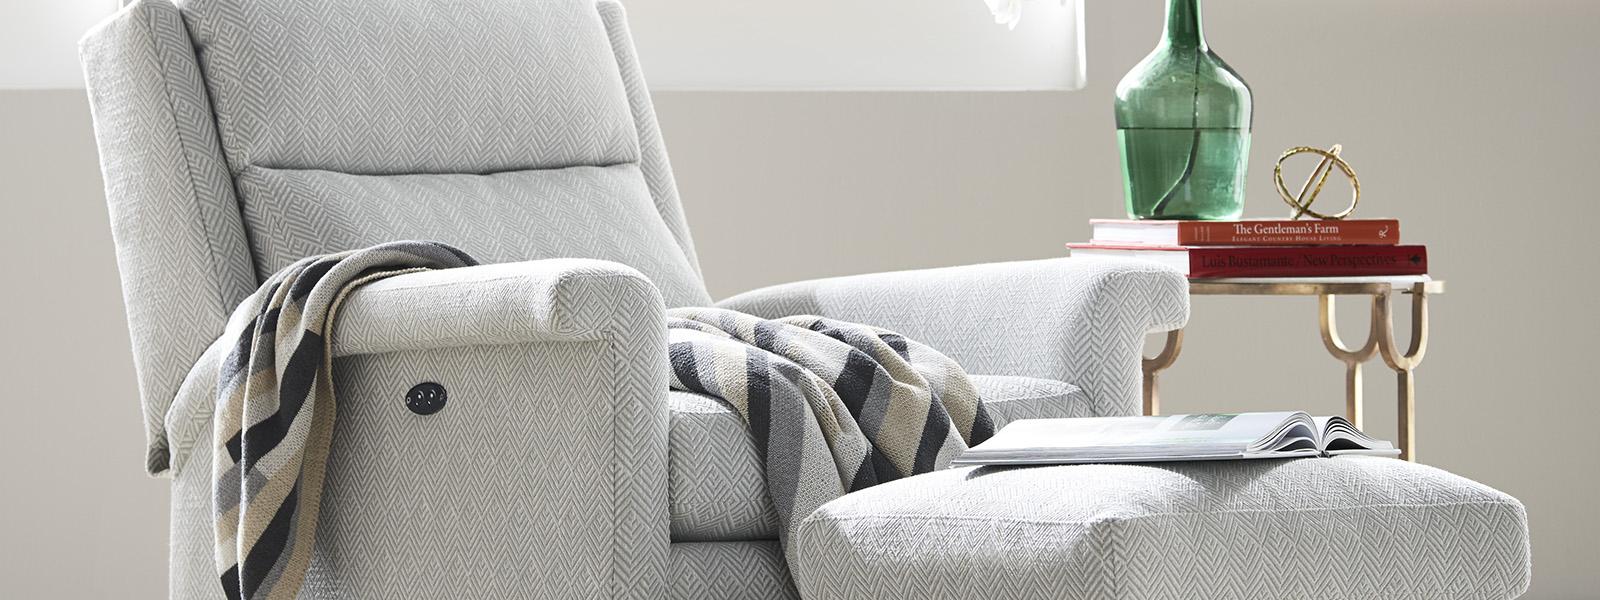 Wesley Hall Furniture Regarding Escondido Sofa Chairs (Image 25 of 25)